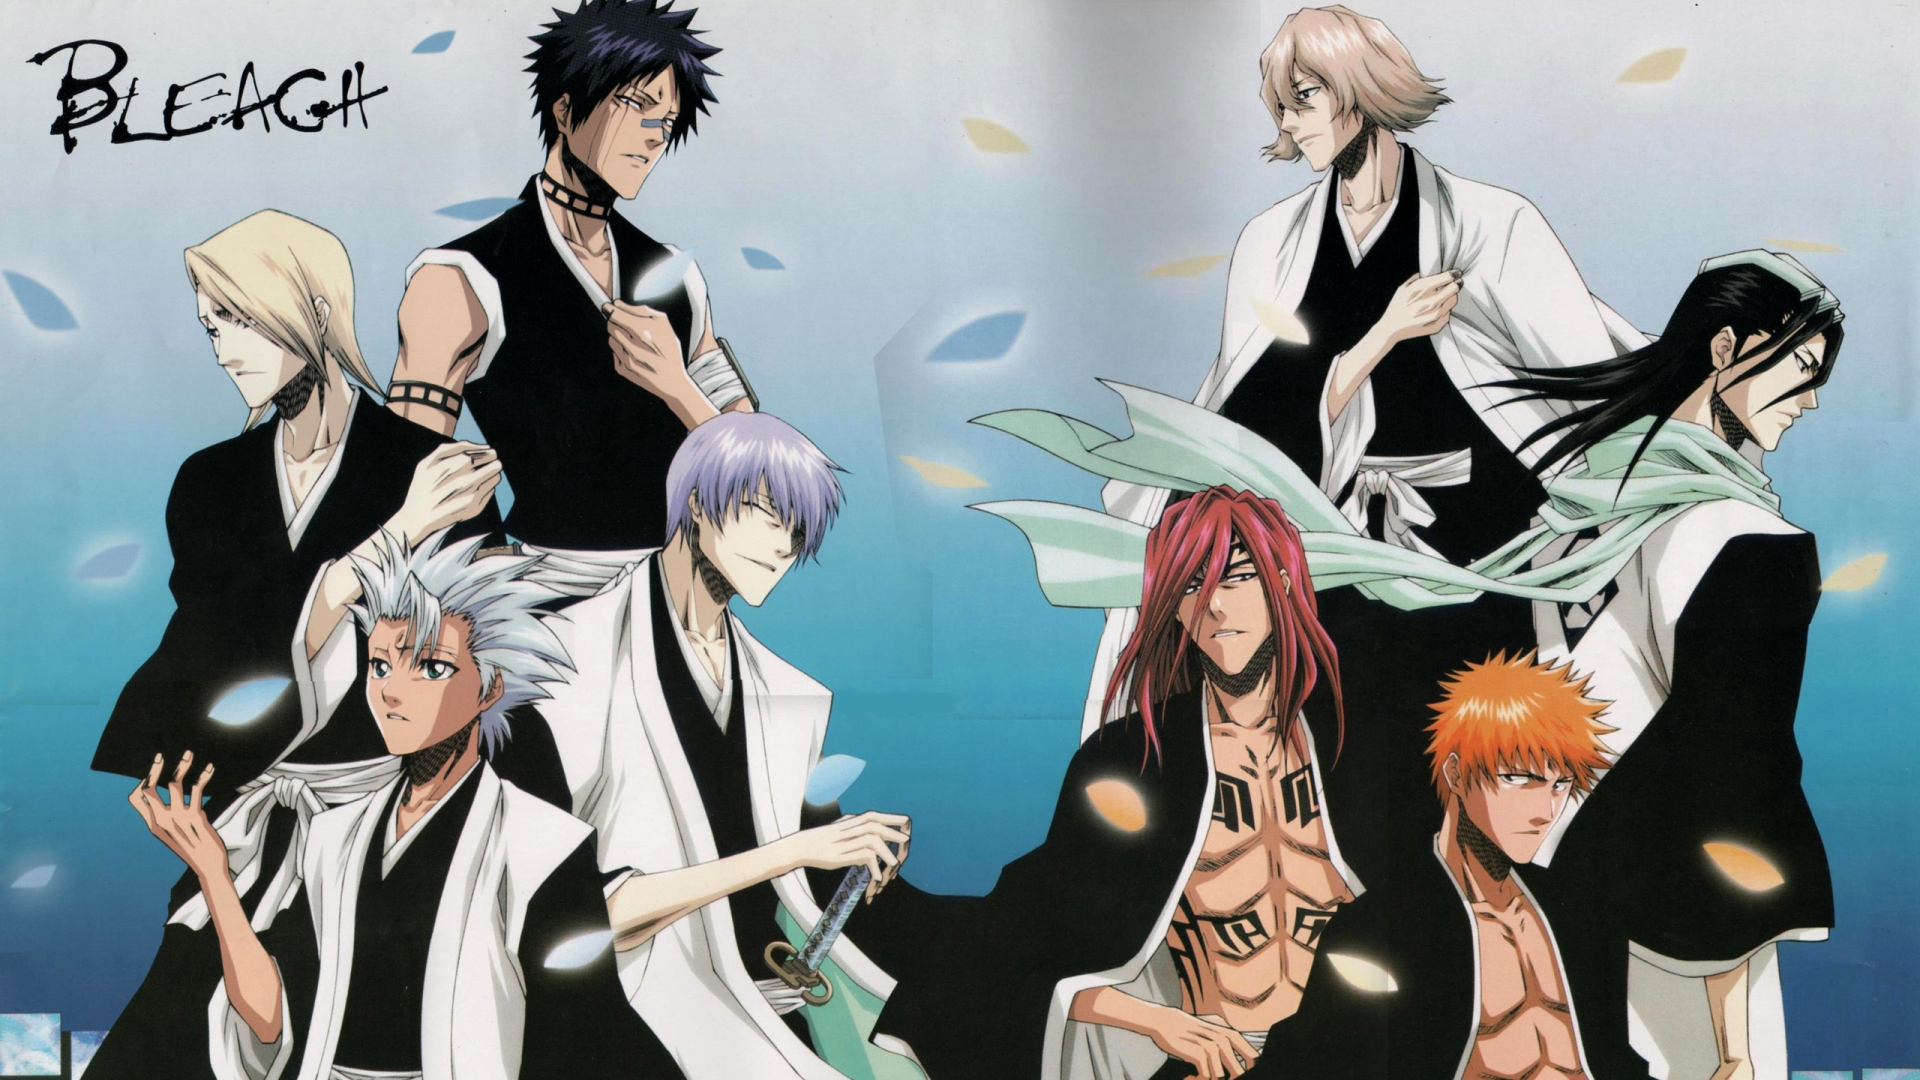 Unduh 410 Koleksi Wallpaper Hd Anime Manga Gratis Terbaru